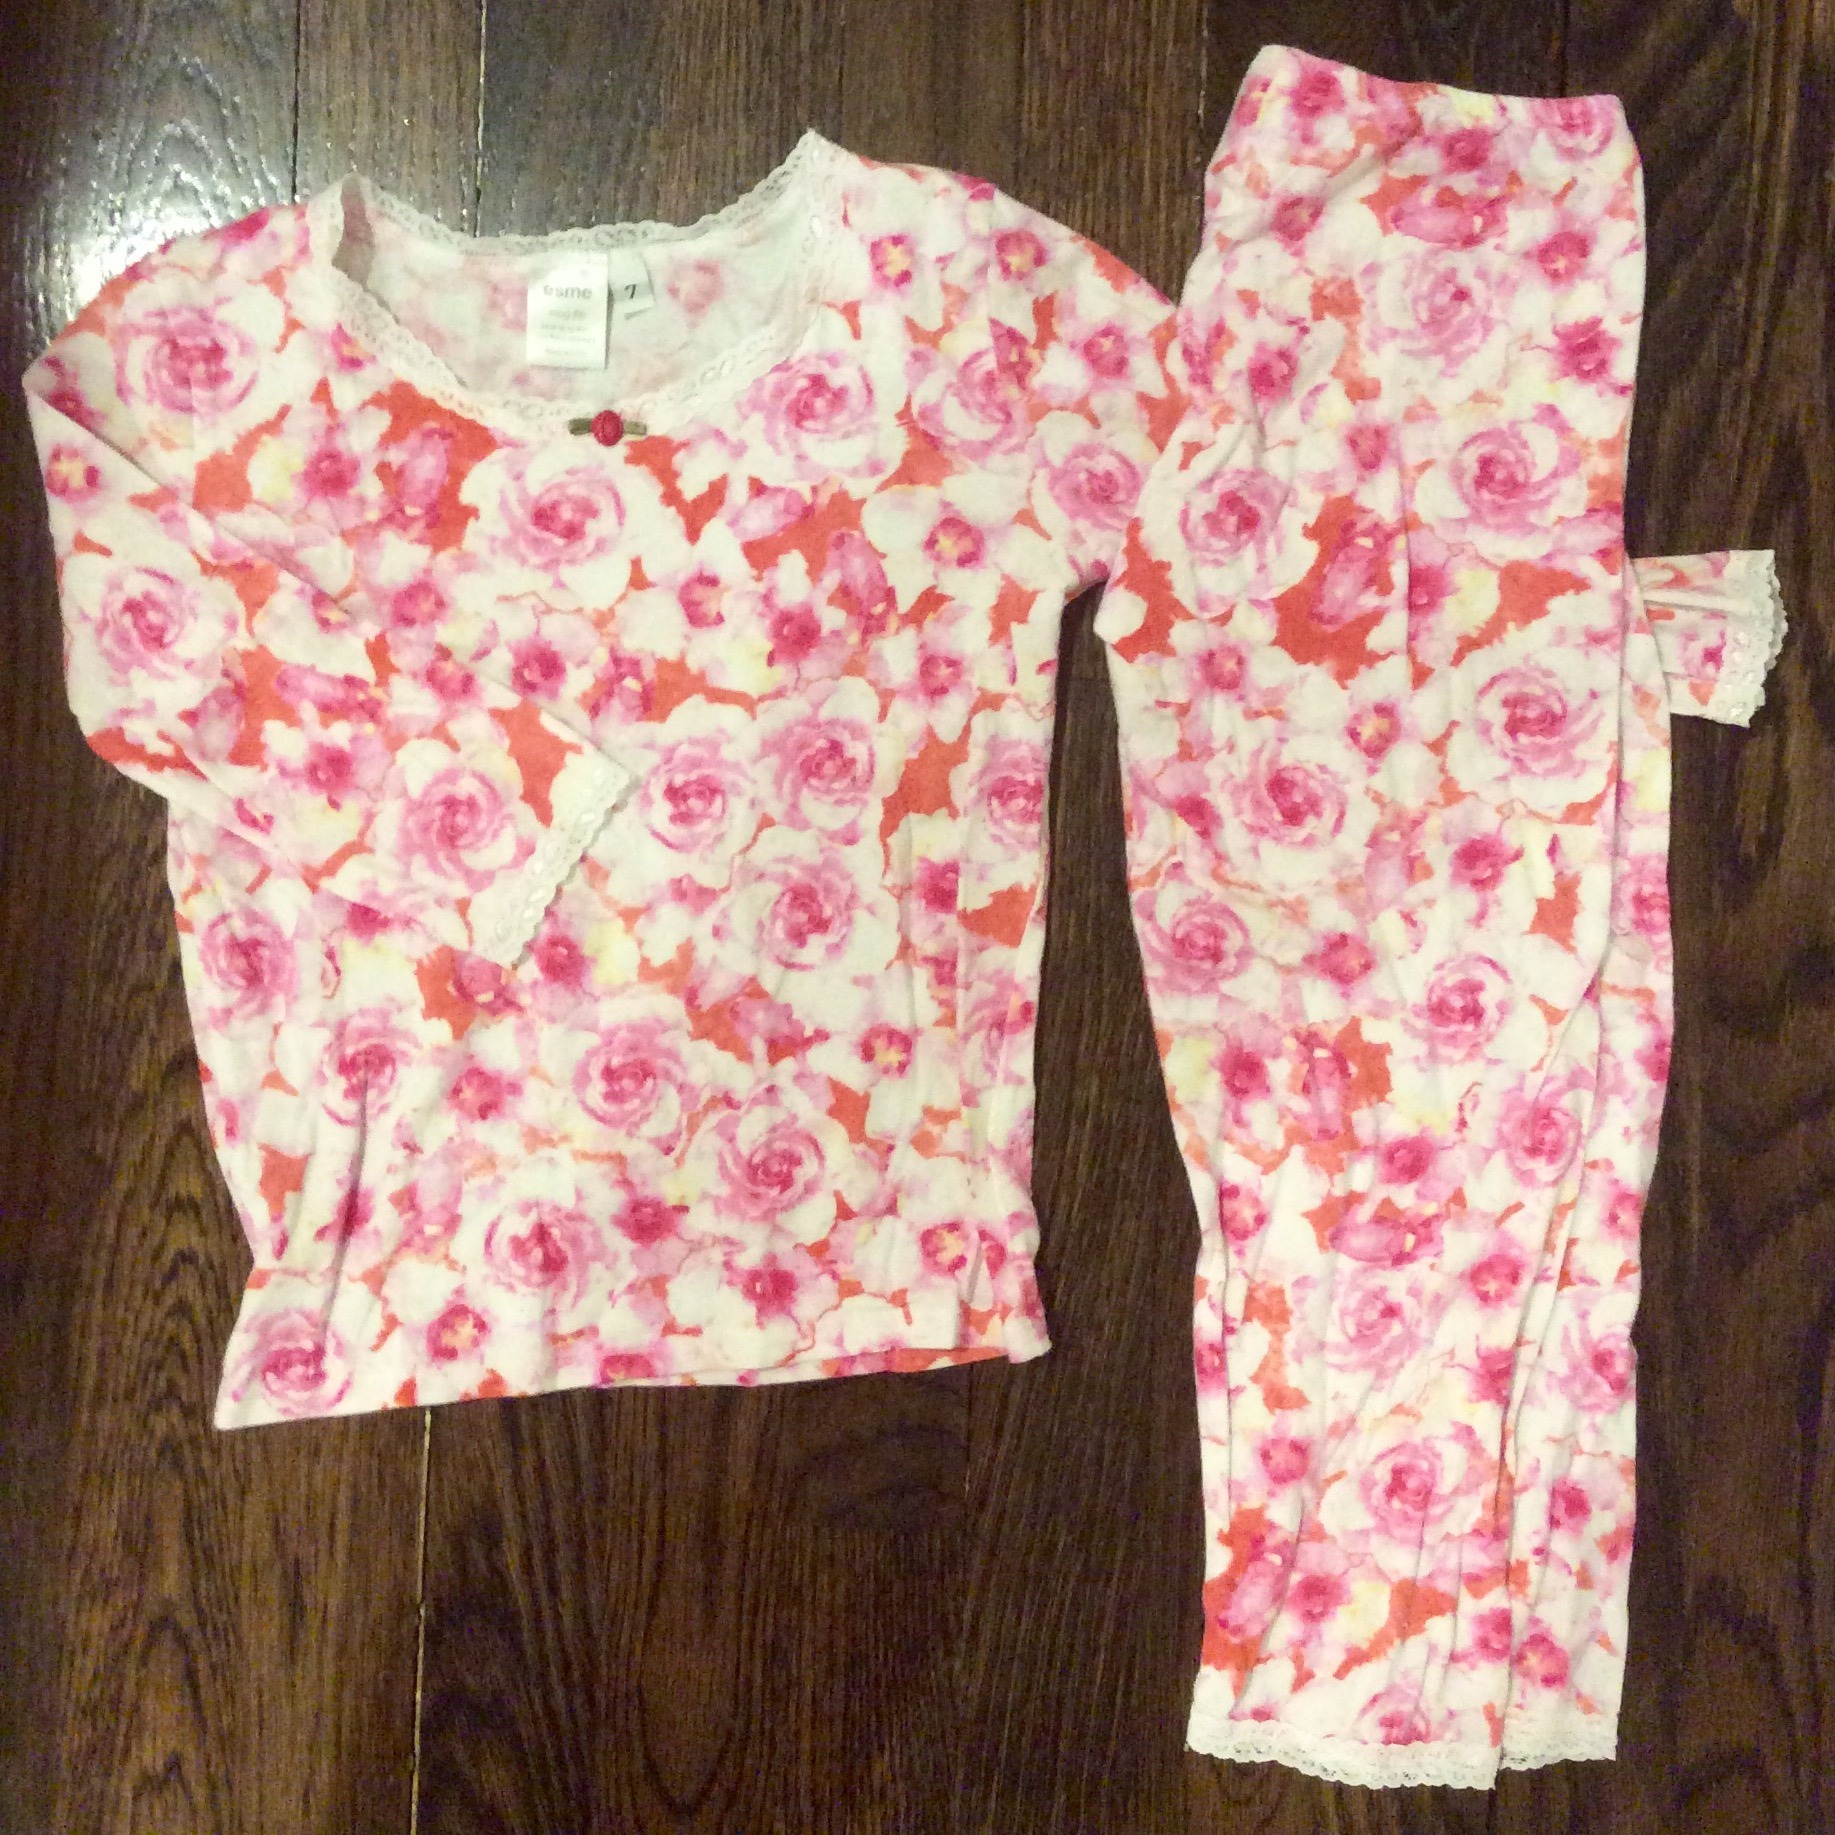 Esme-Size-7-Pink-Pajama_7685A.jpg